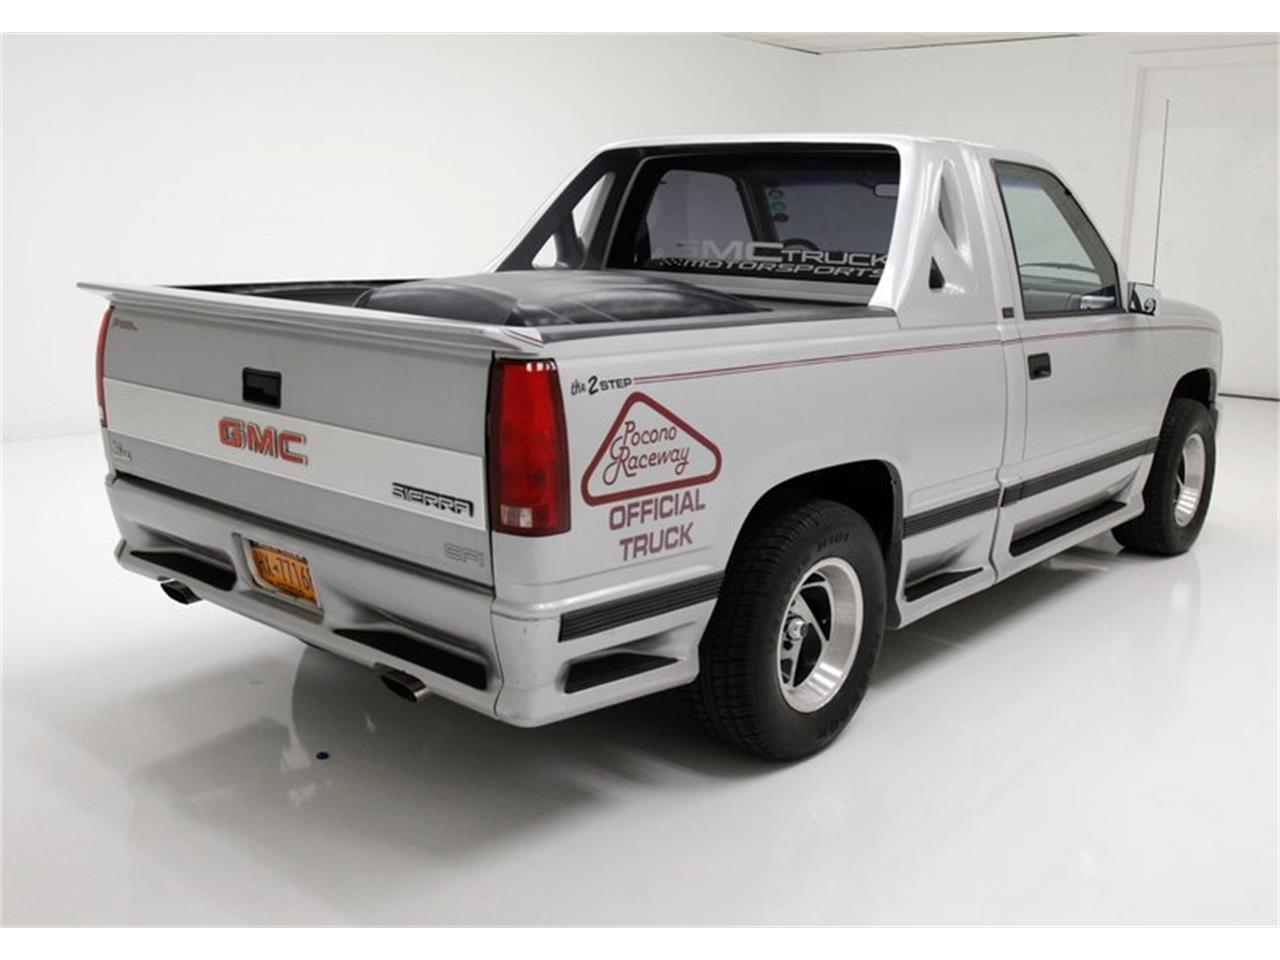 1990 GMC Sierra (CC-1359123) for sale in Morgantown, Pennsylvania